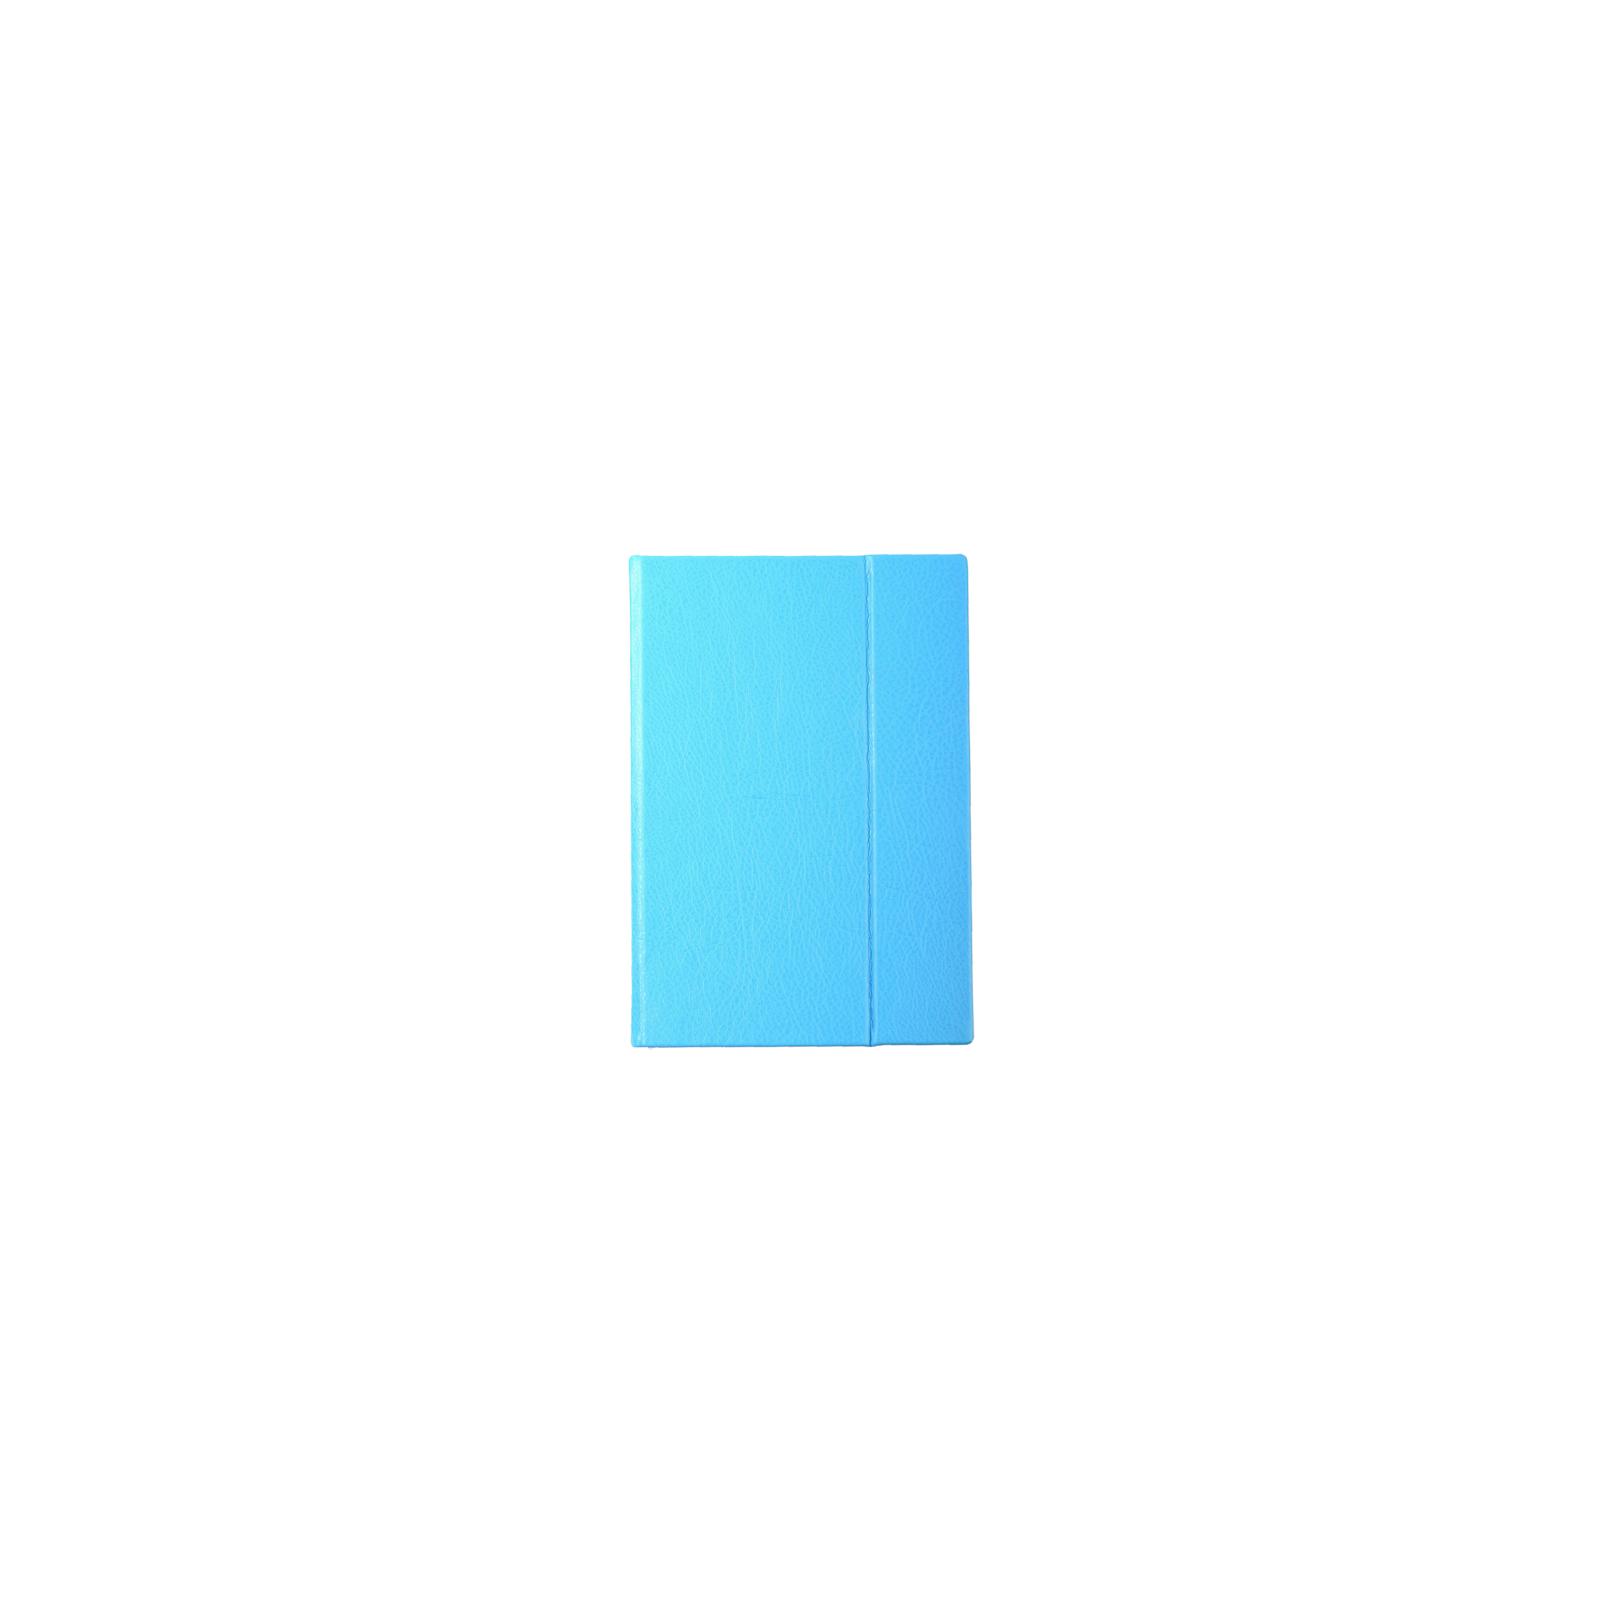 Чехол для планшета Vento 10.1 Desire Bright -blue изображение 2